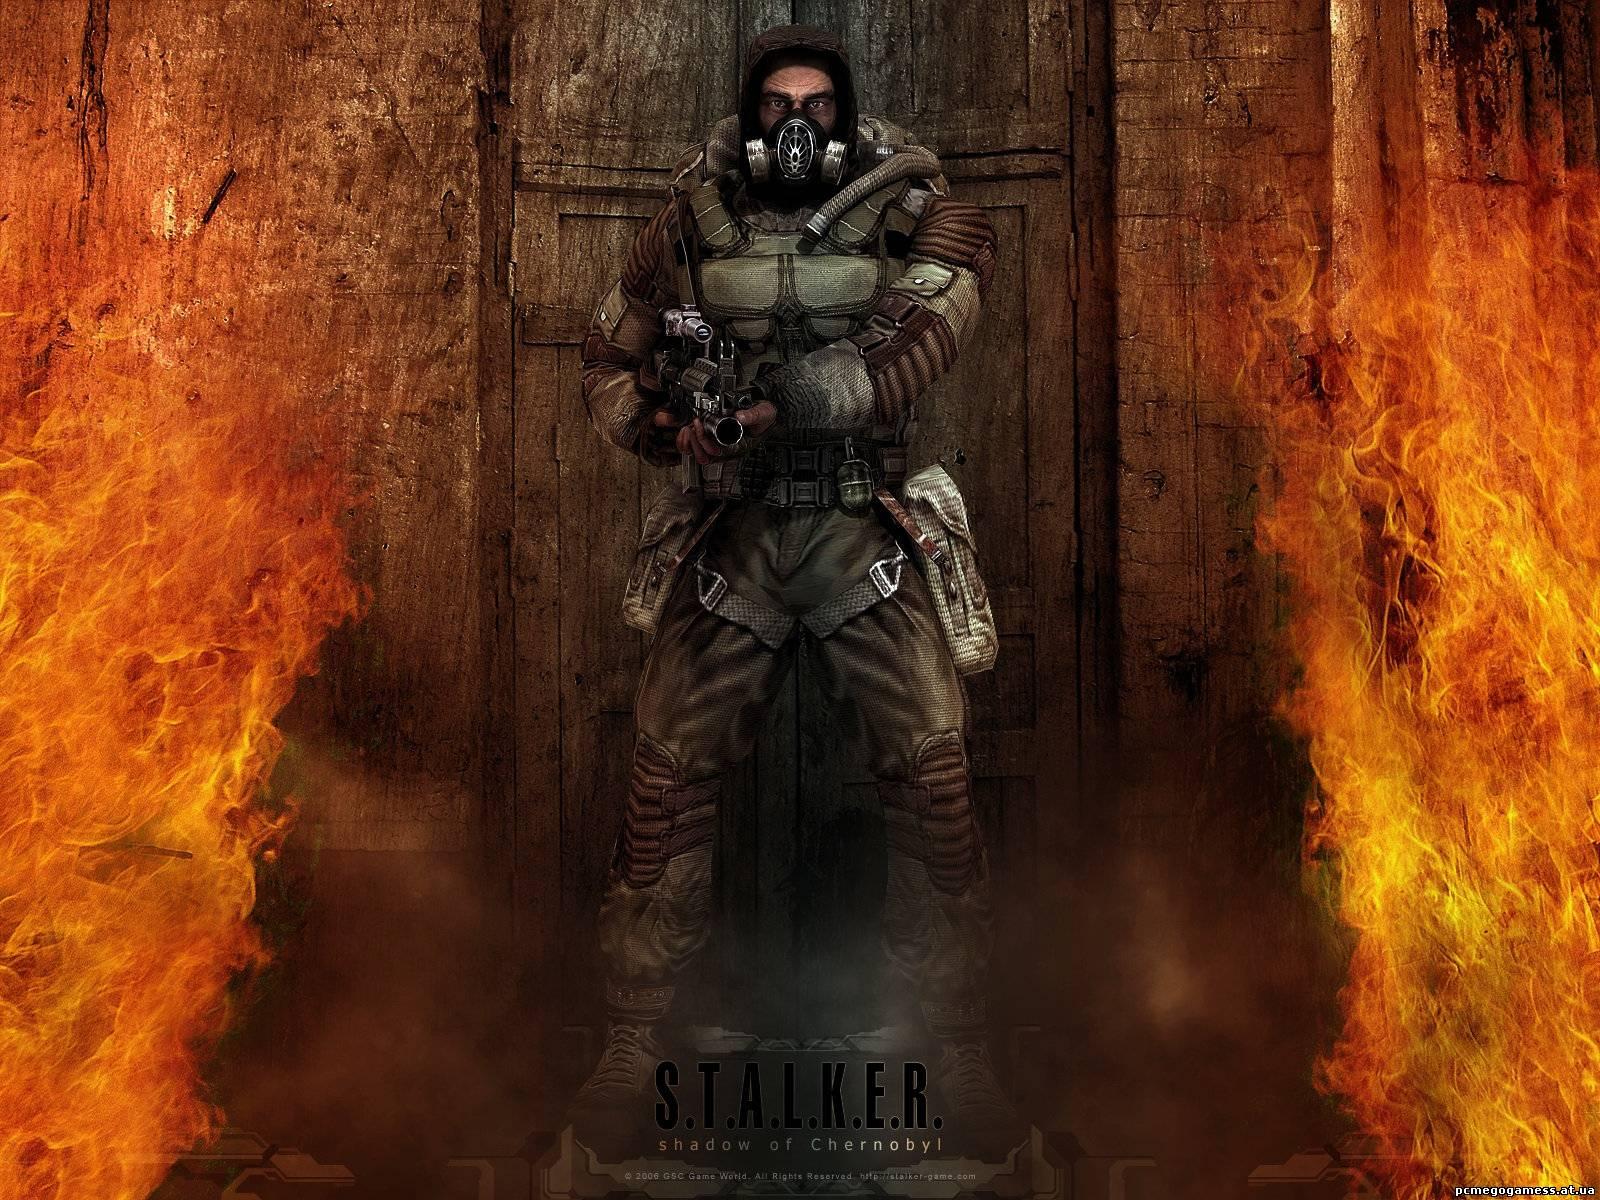 Обои S.T.A.L.K.E.R. Shadow of Chernobyl (Сталкер)Обои игры 1600x1200.